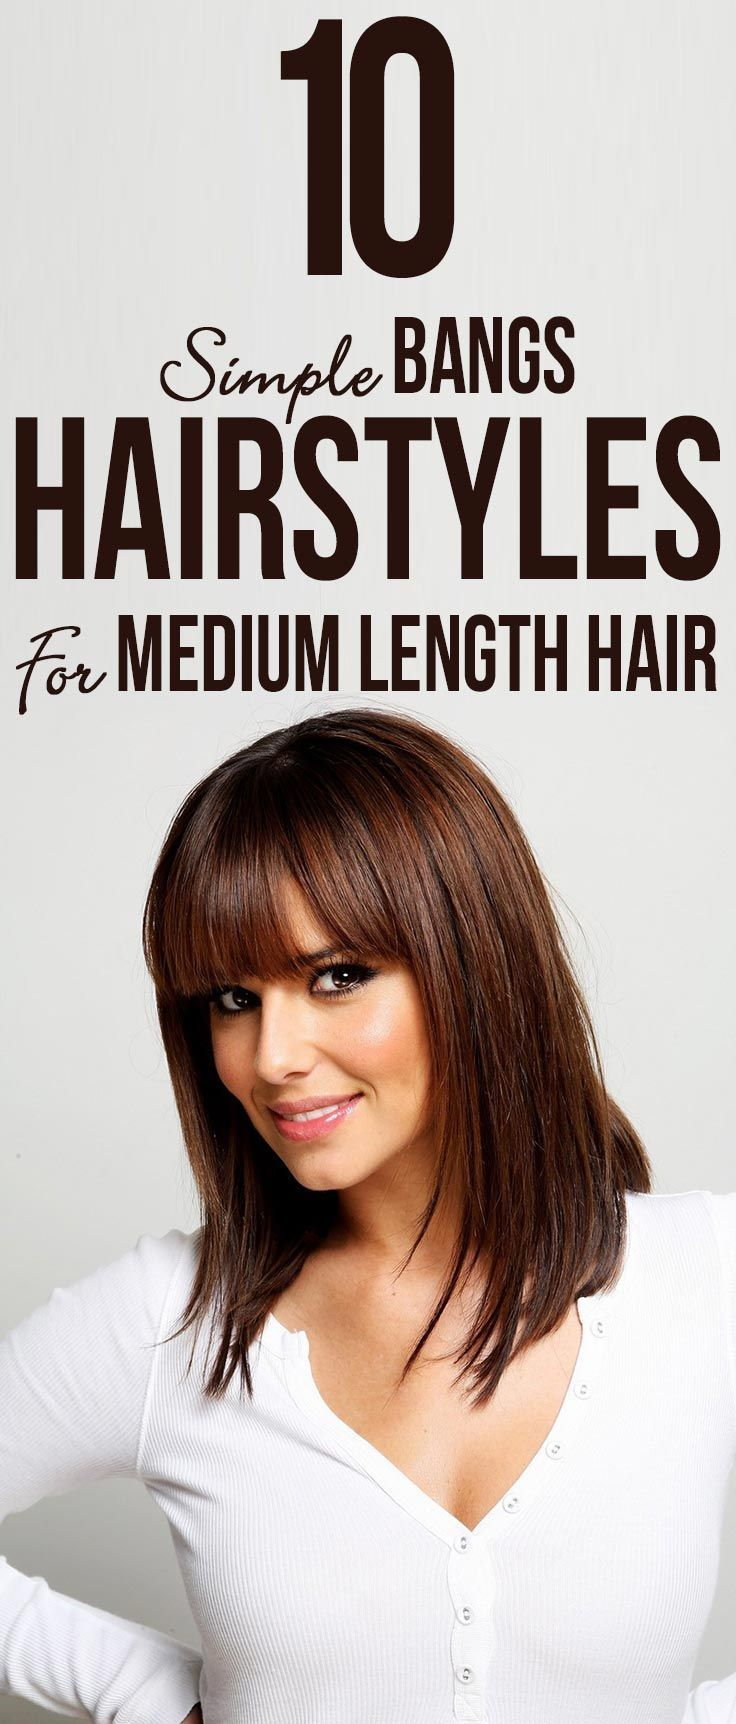 10 Simple Bangs Hairstyles For Medium Length Hair | Medium hair styles, Short hair styles, Hair ...